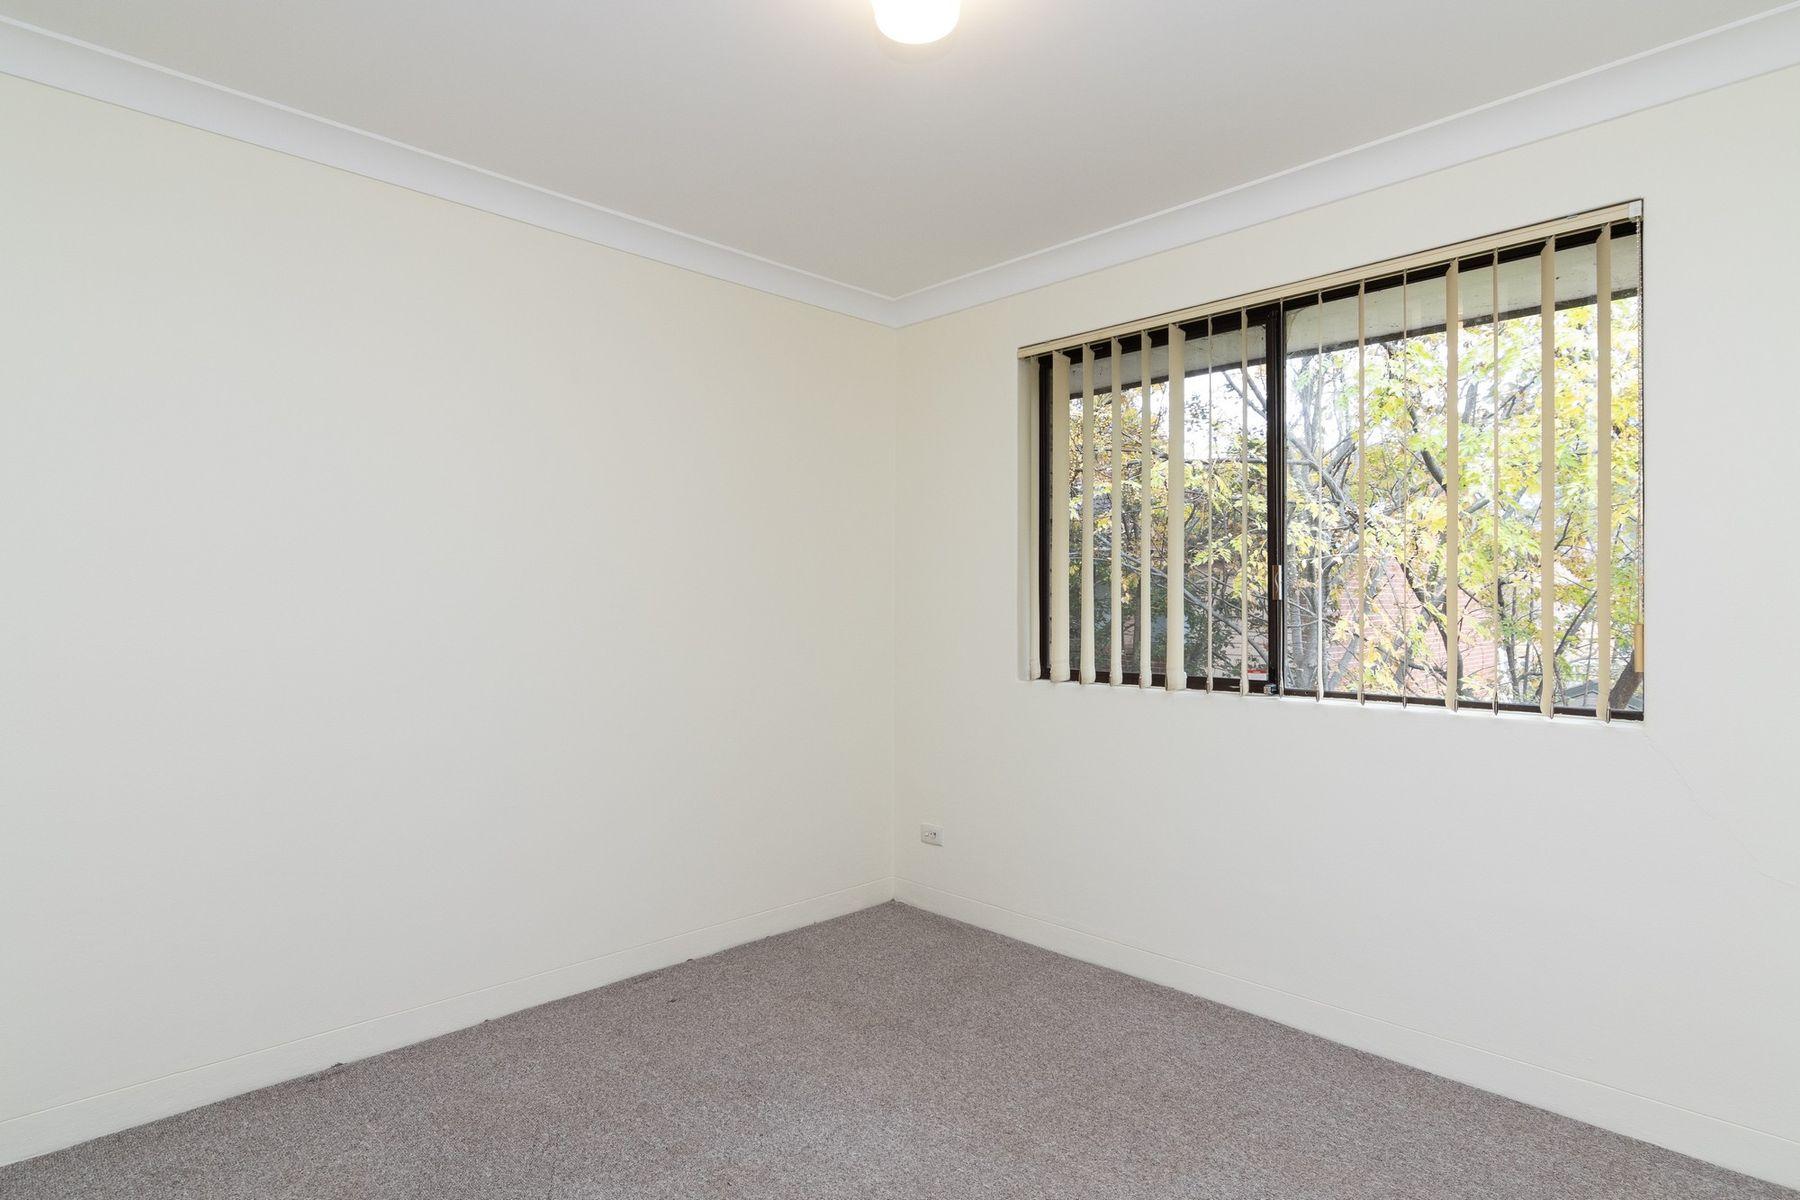 3/78-80 Union Road, Penrith, NSW 2750